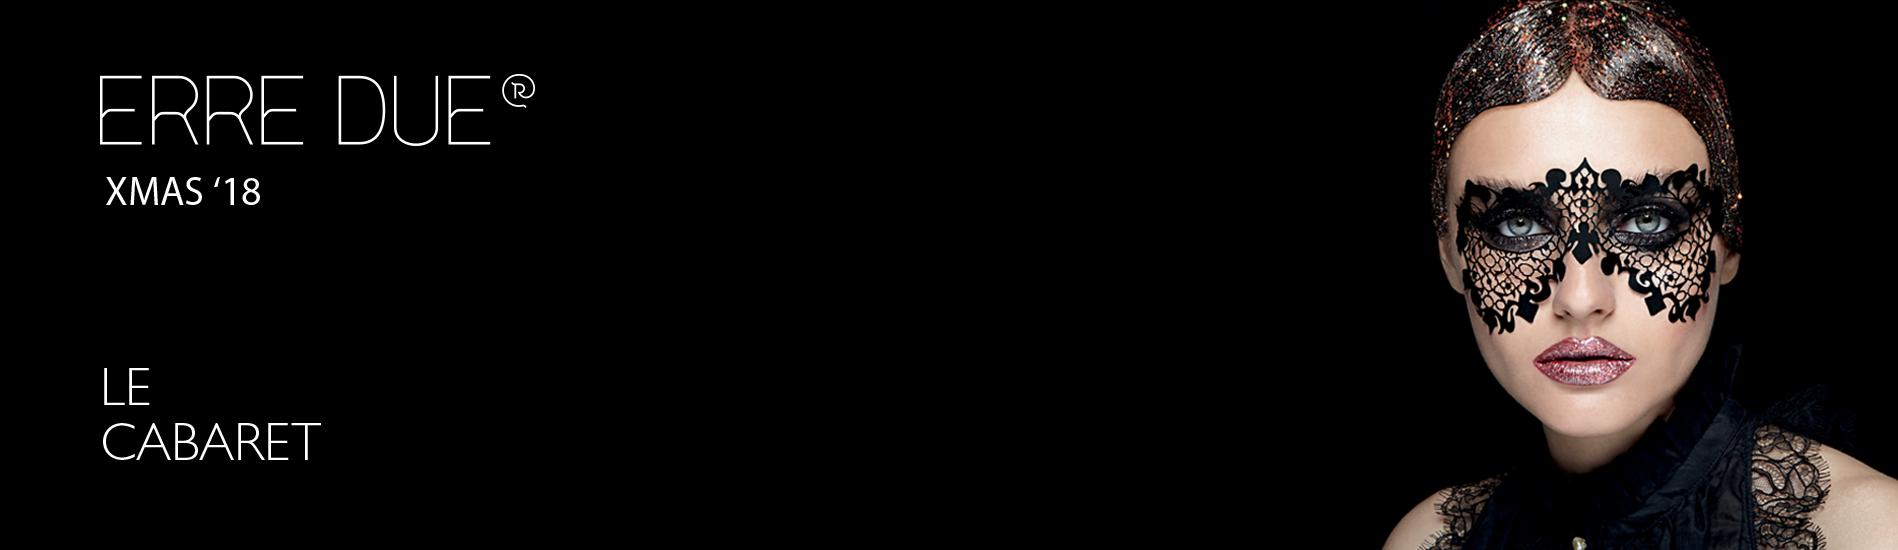 xmas-18-slider-aromca